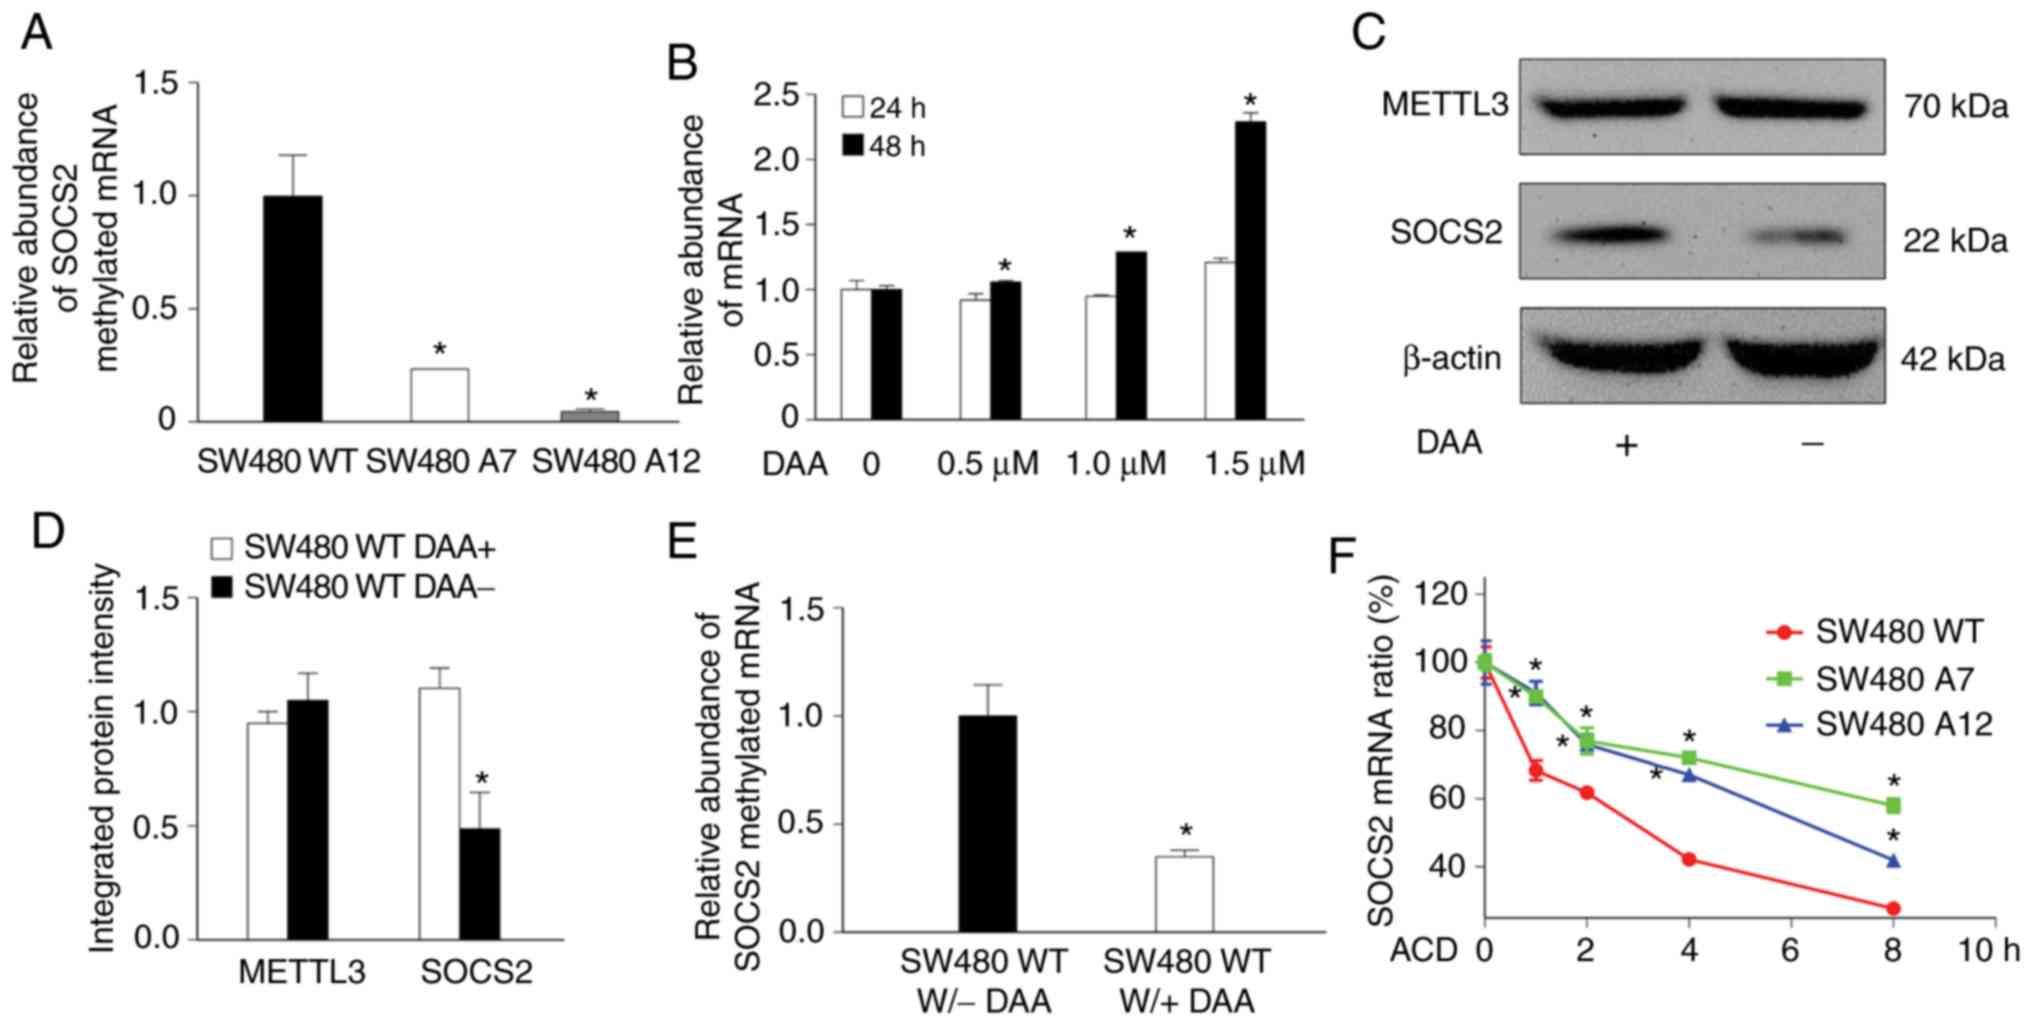 DNA methyltransferase 3, a target of microRNA-29c